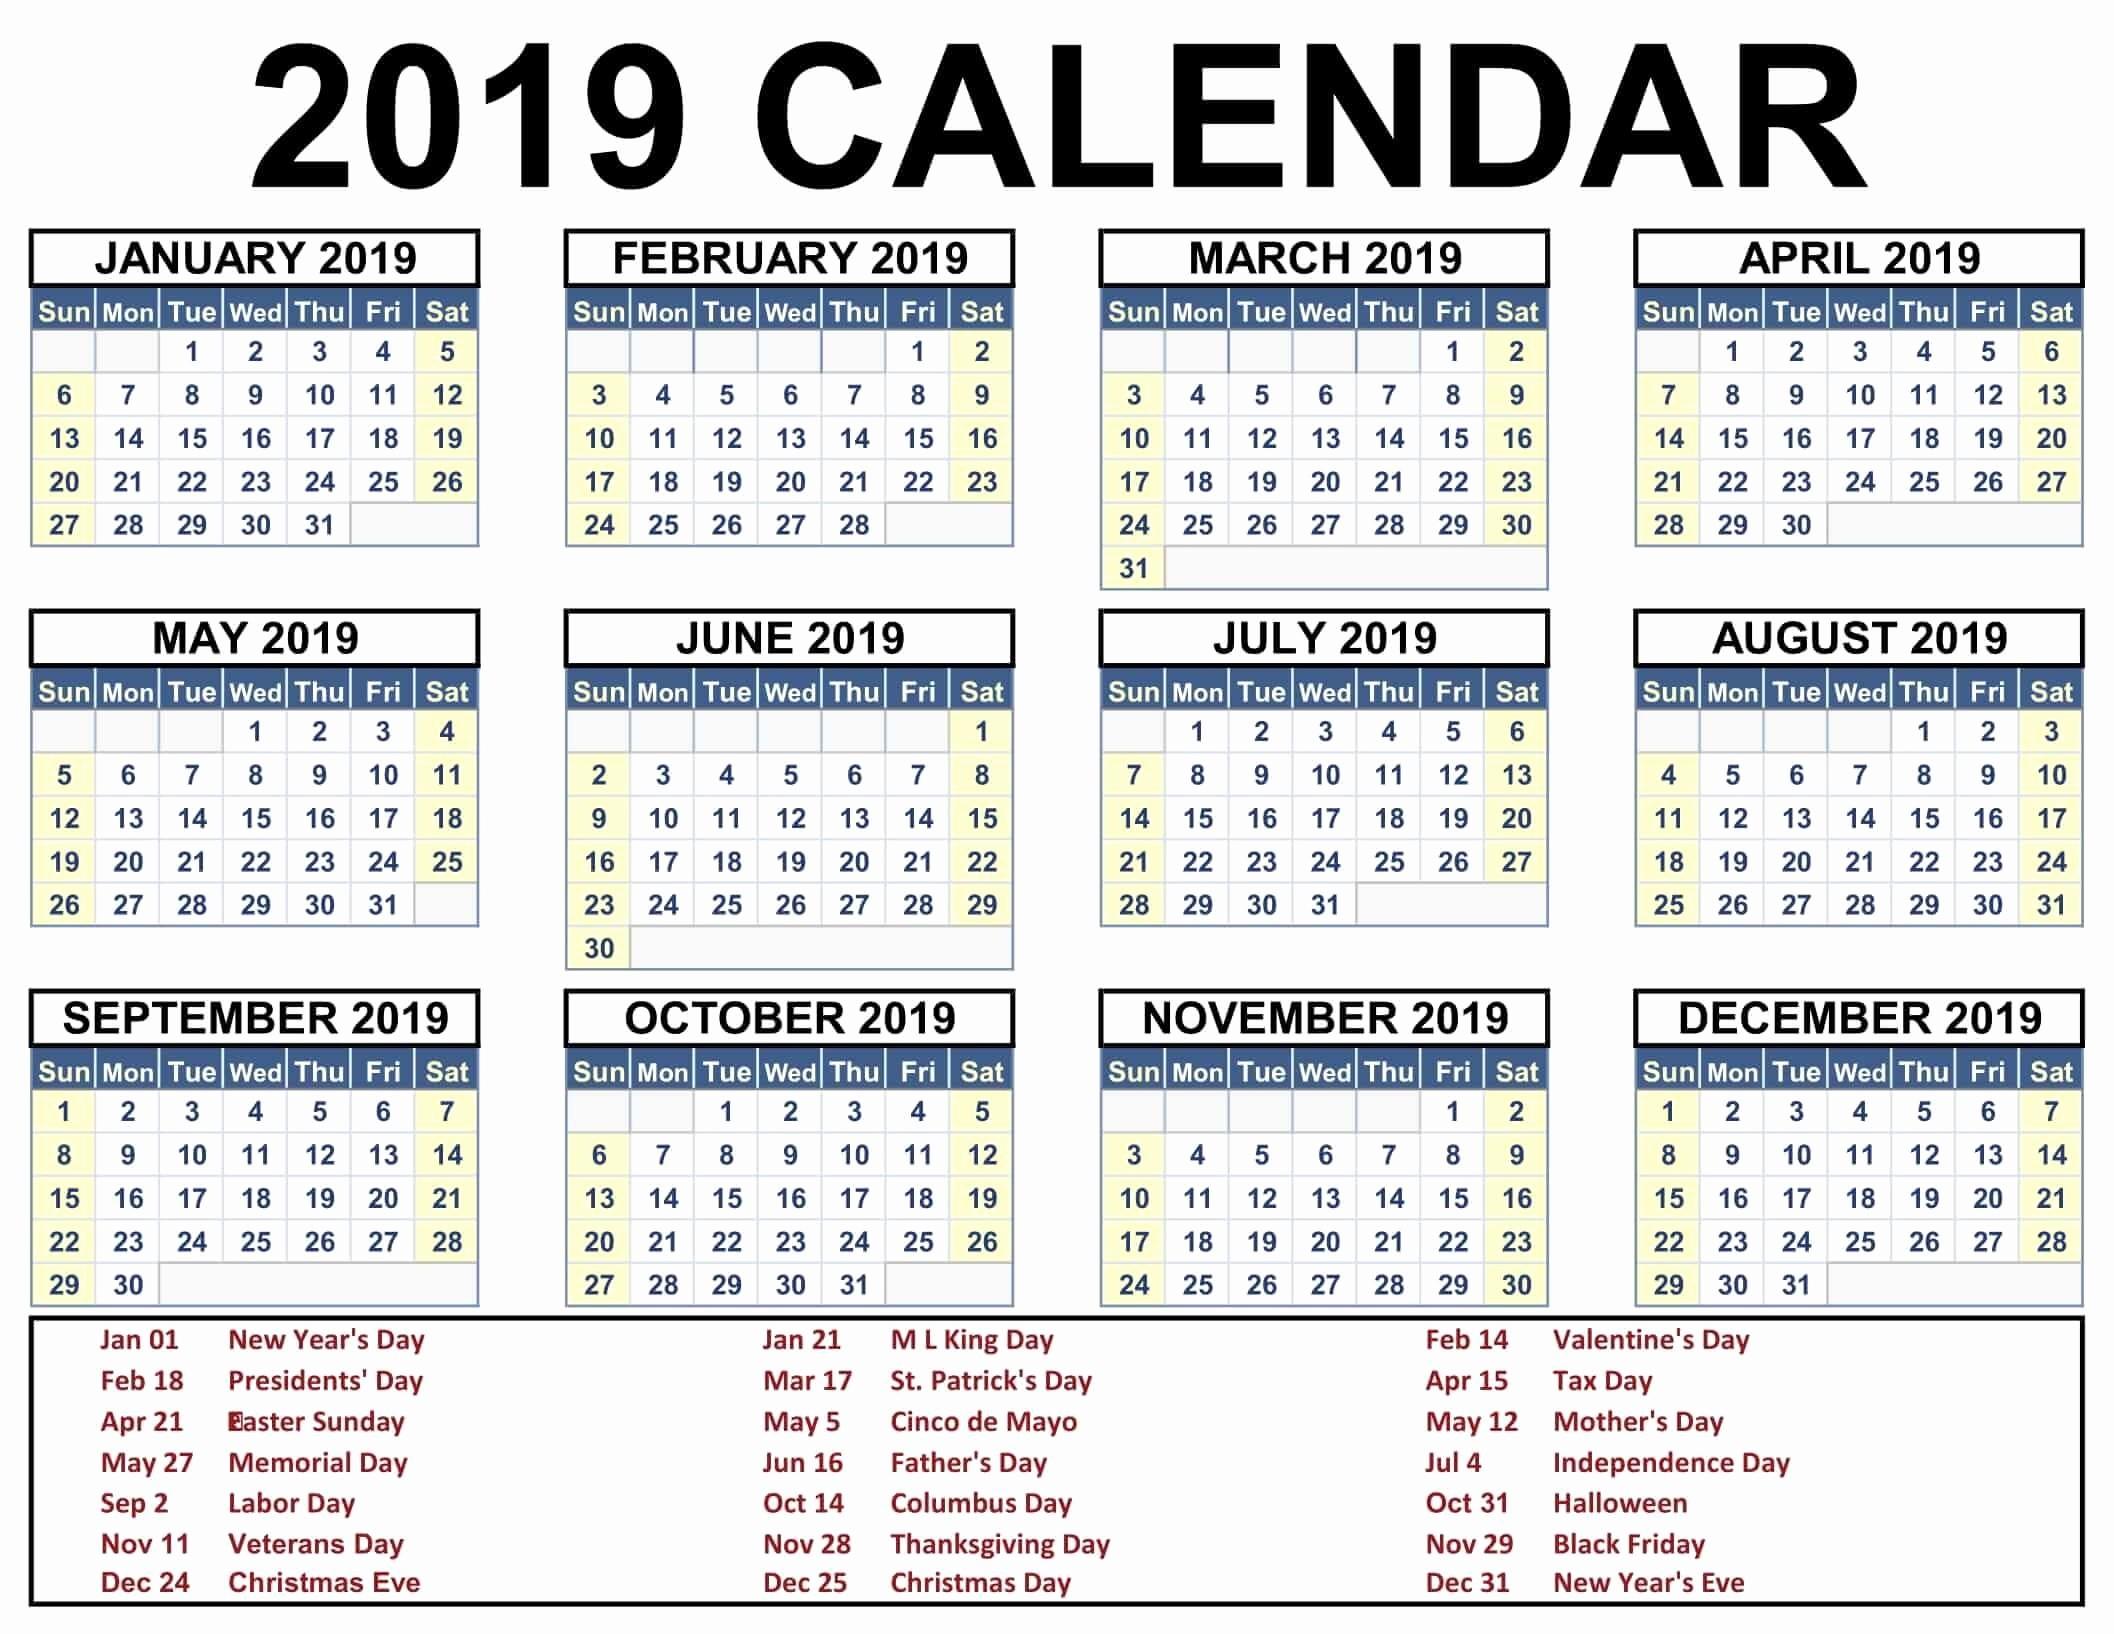 Luxury 32 Examples Hanukkah 2019 2020 Calendar | Etxettipia-2020 Calendar With Religious Holidays